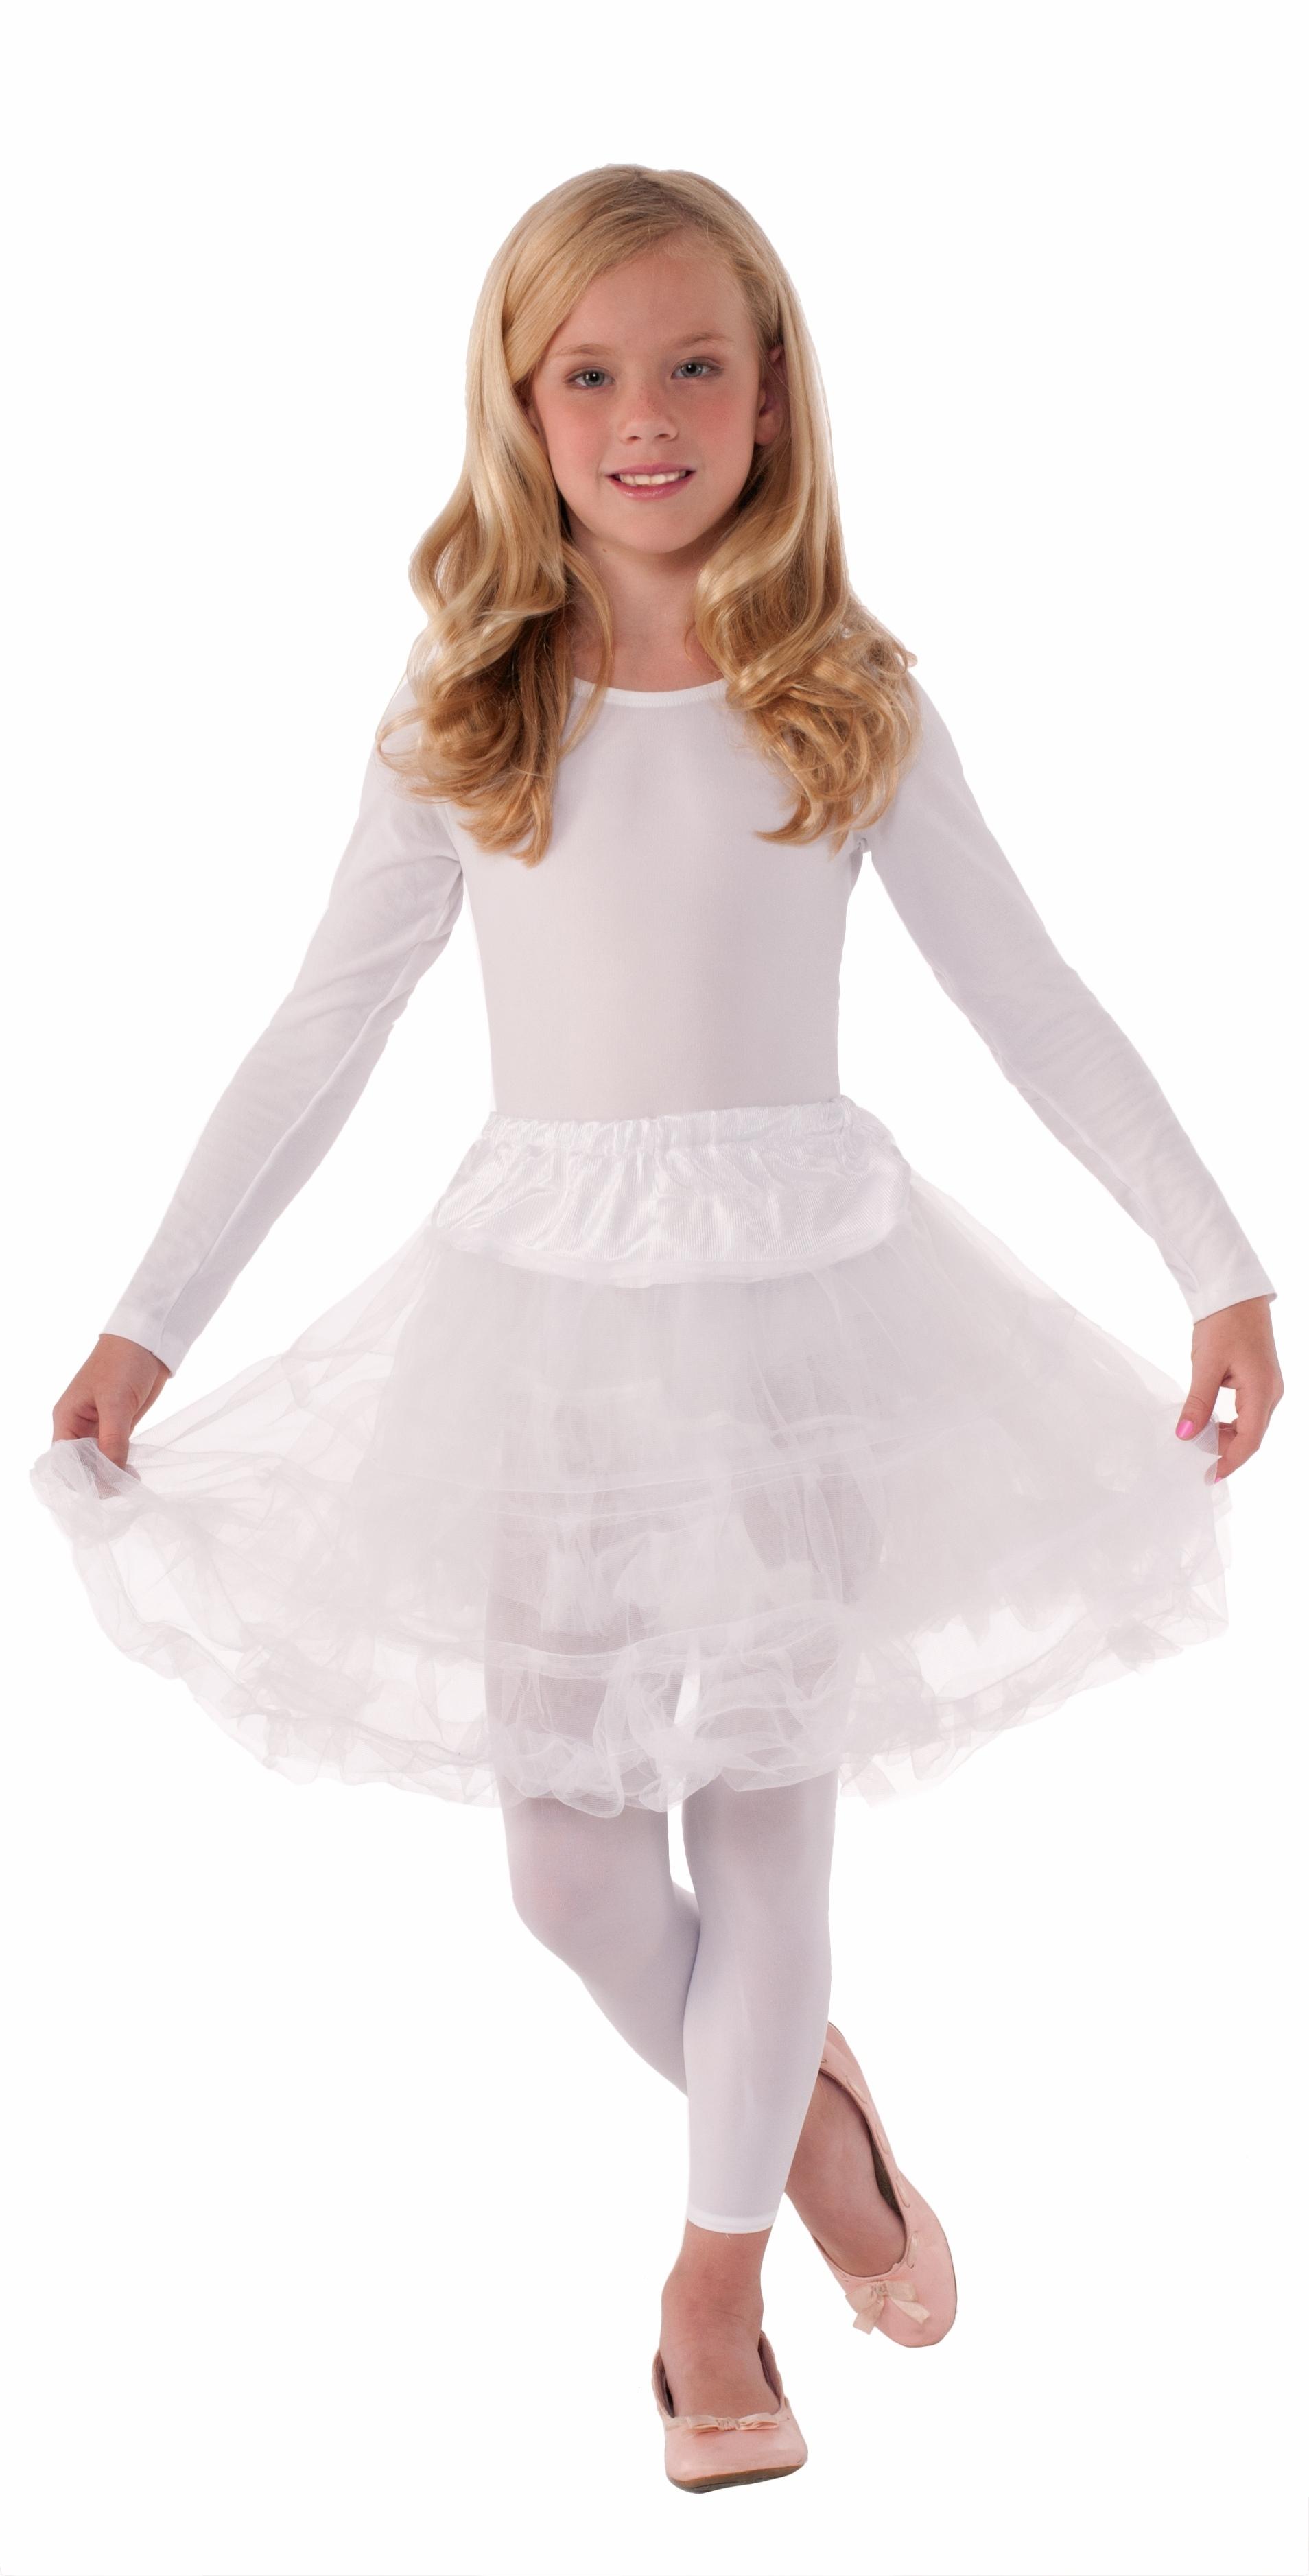 Детский белый подъюбник (UNI) -  Подъюбники и юбки